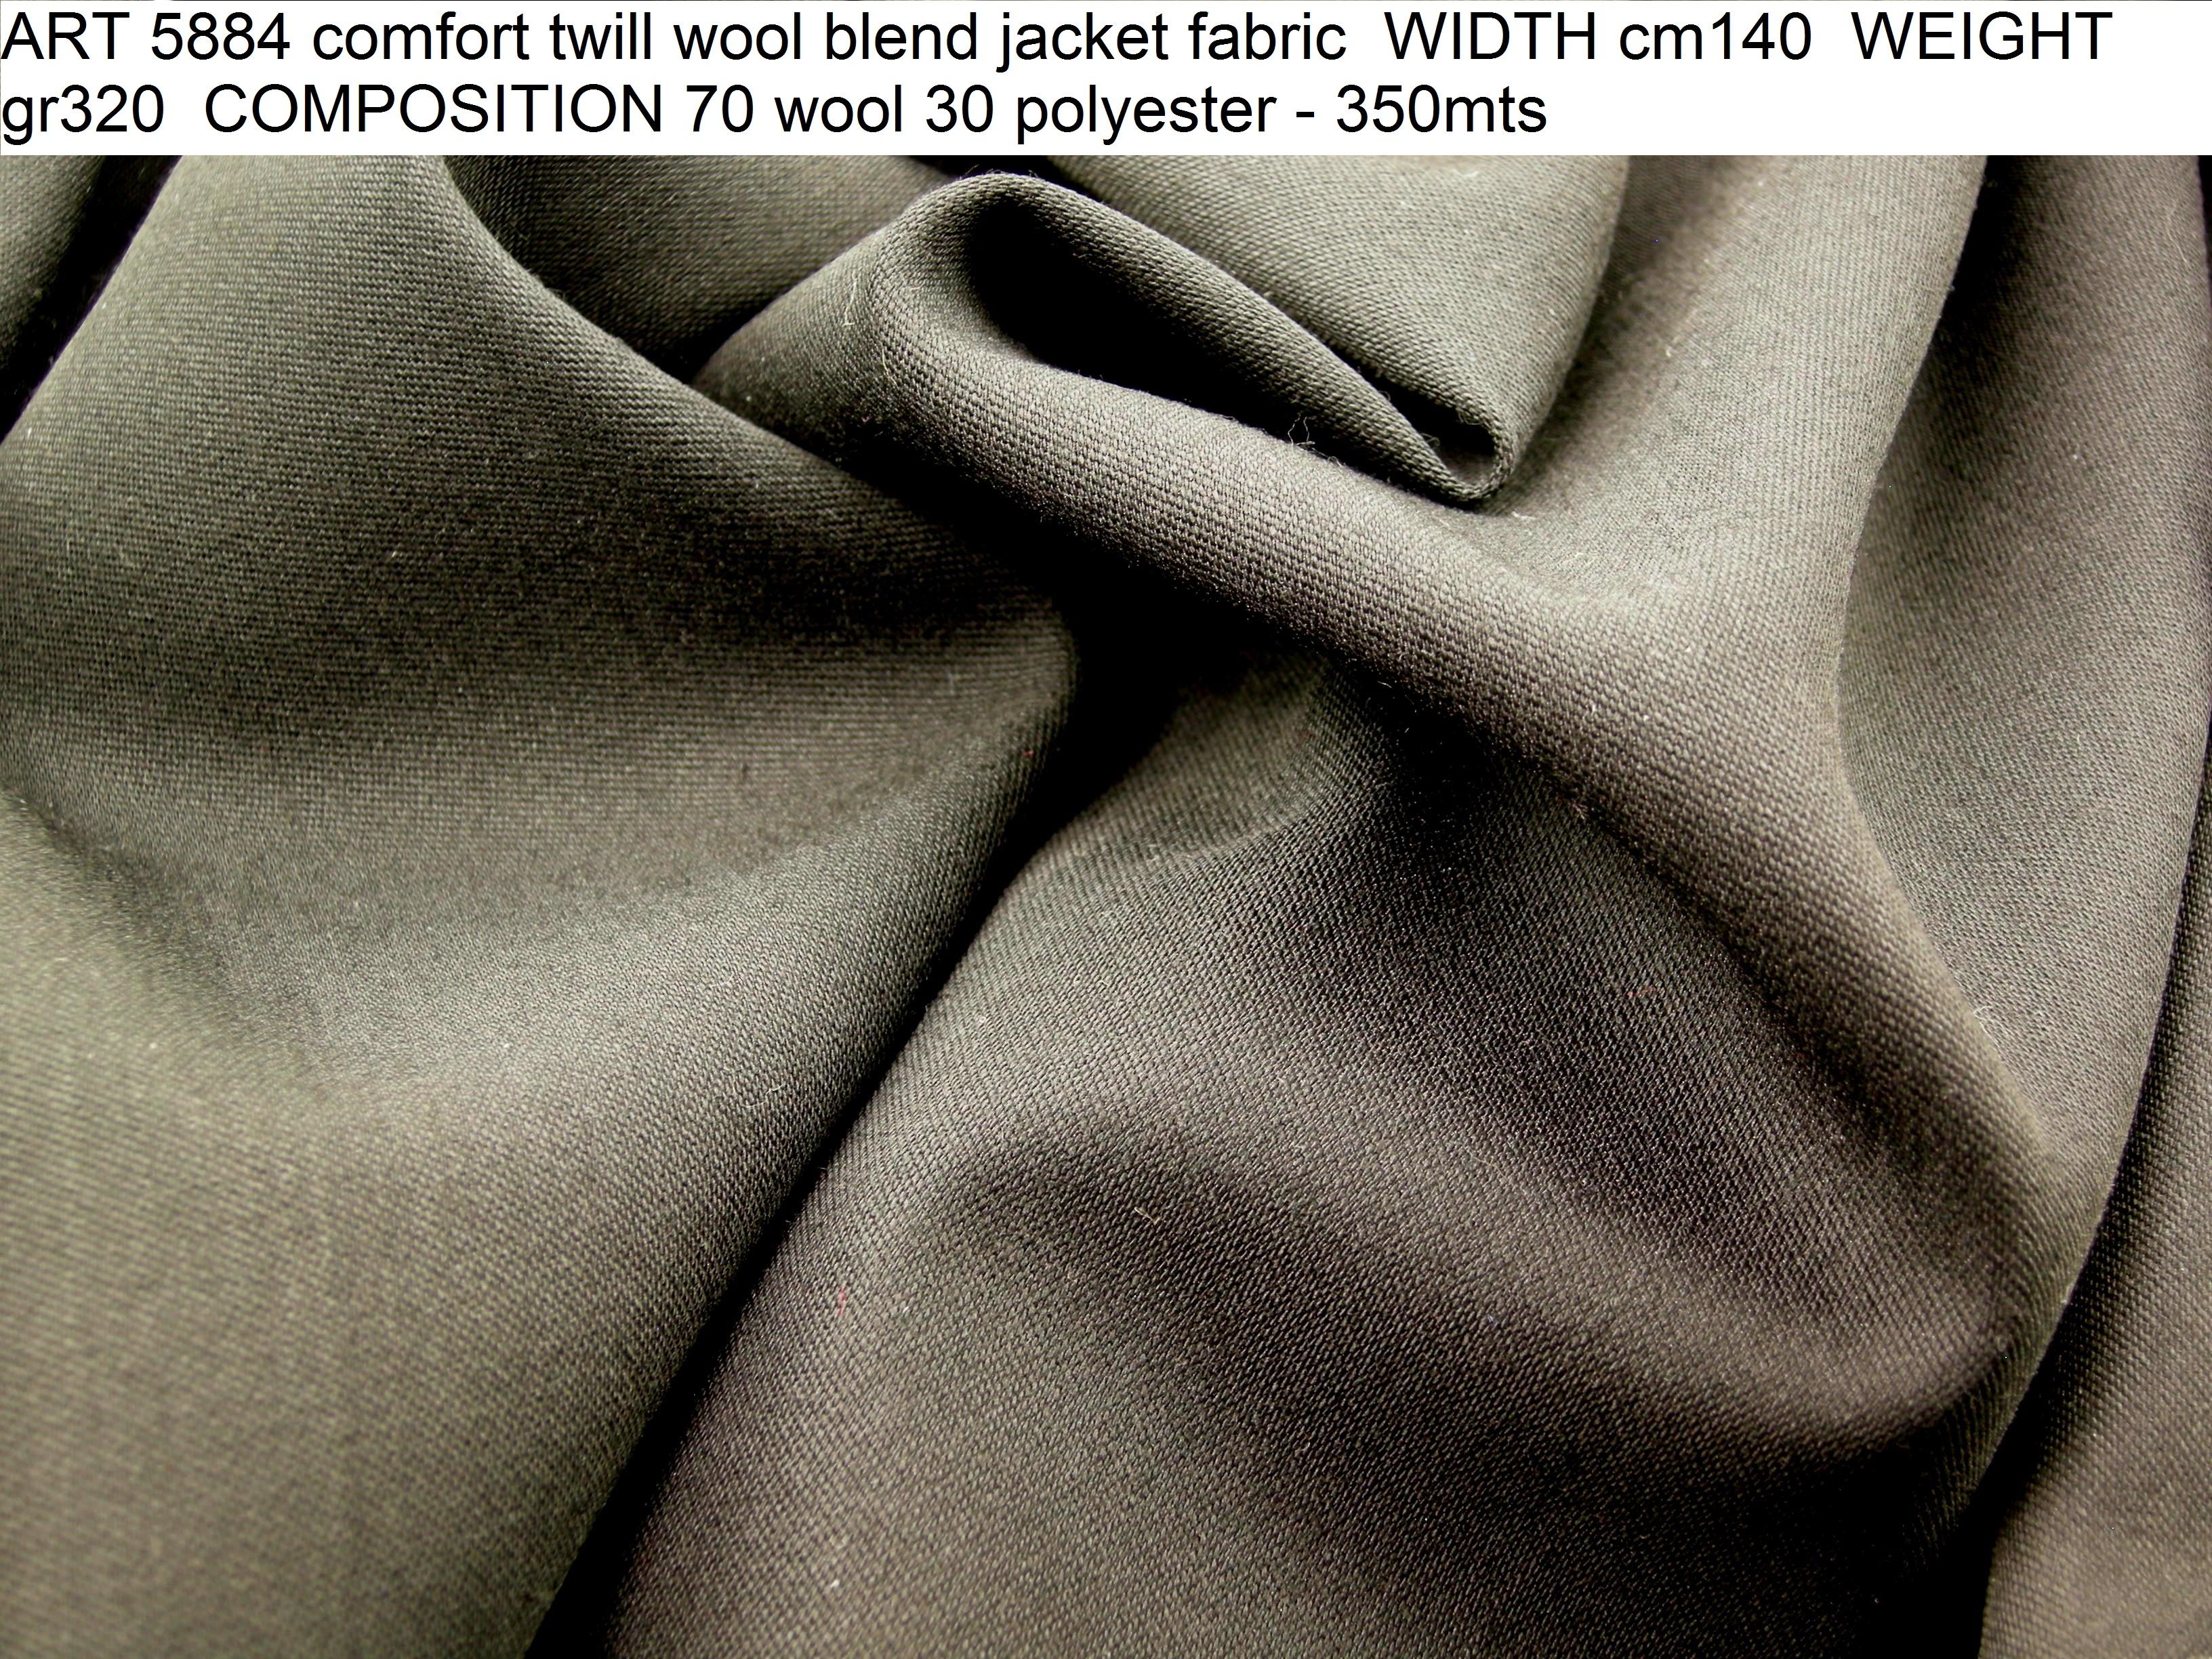 ART 5884 comfort twill wool blend jacket fabric WIDTH cm140 WEIGHT gr320 COMPOSITION 70 wool 30 polyester - 350mts